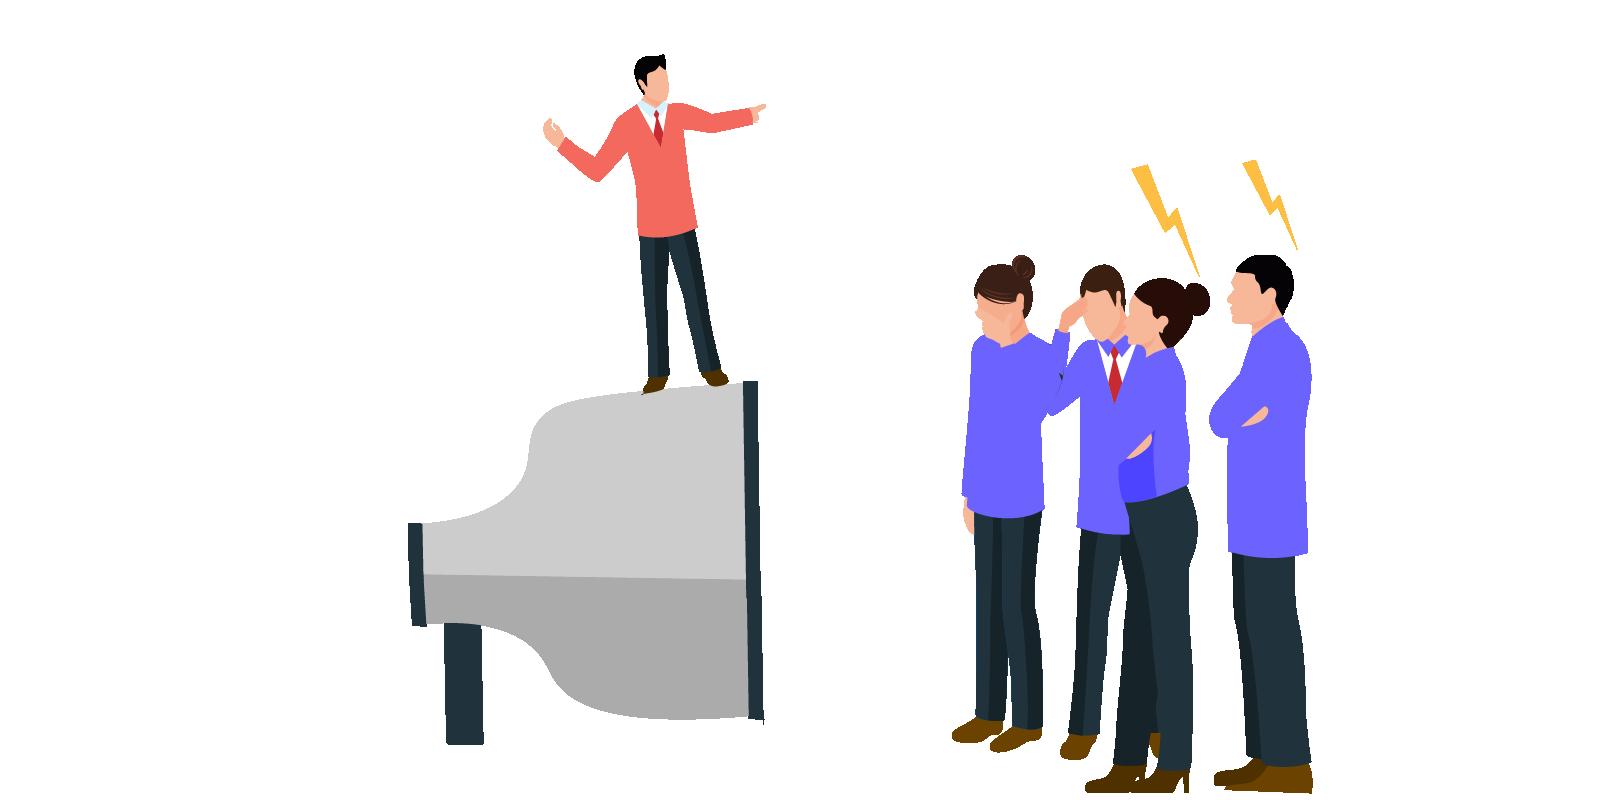 Coercive Leadership characteristics